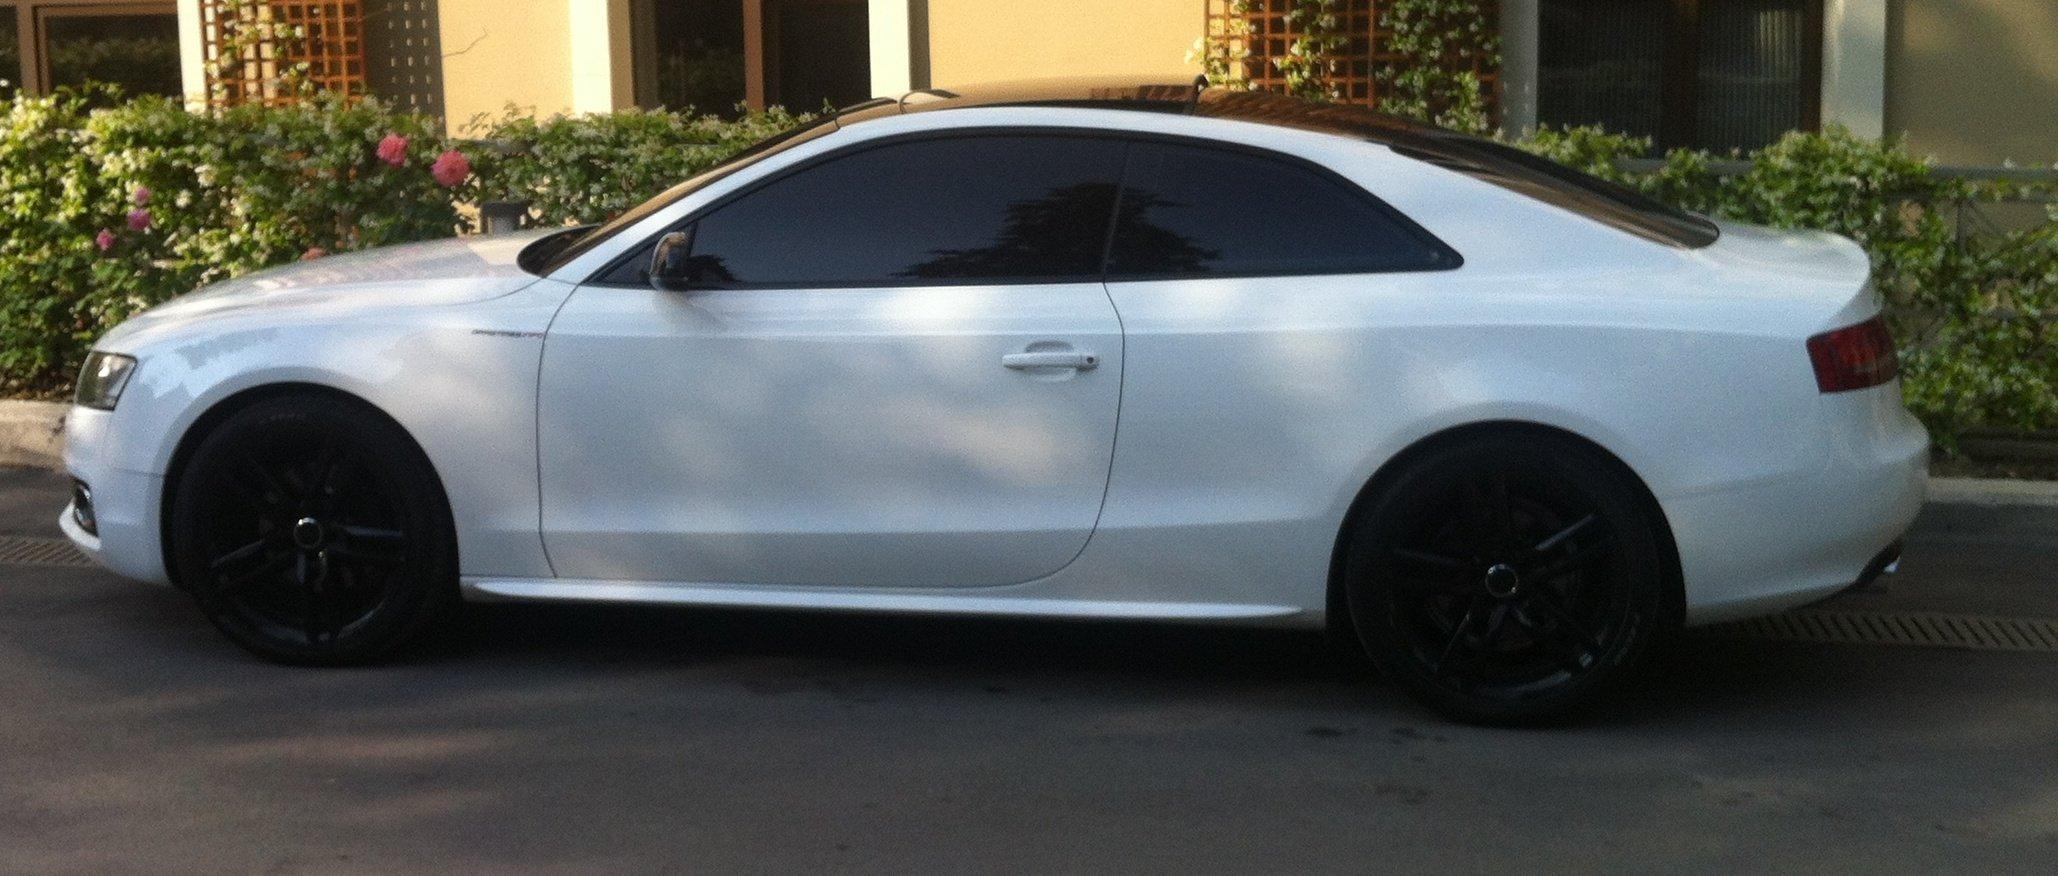 2011 Audi A5 Black Line Edition Audi A5 Forum Audi S5 Forum